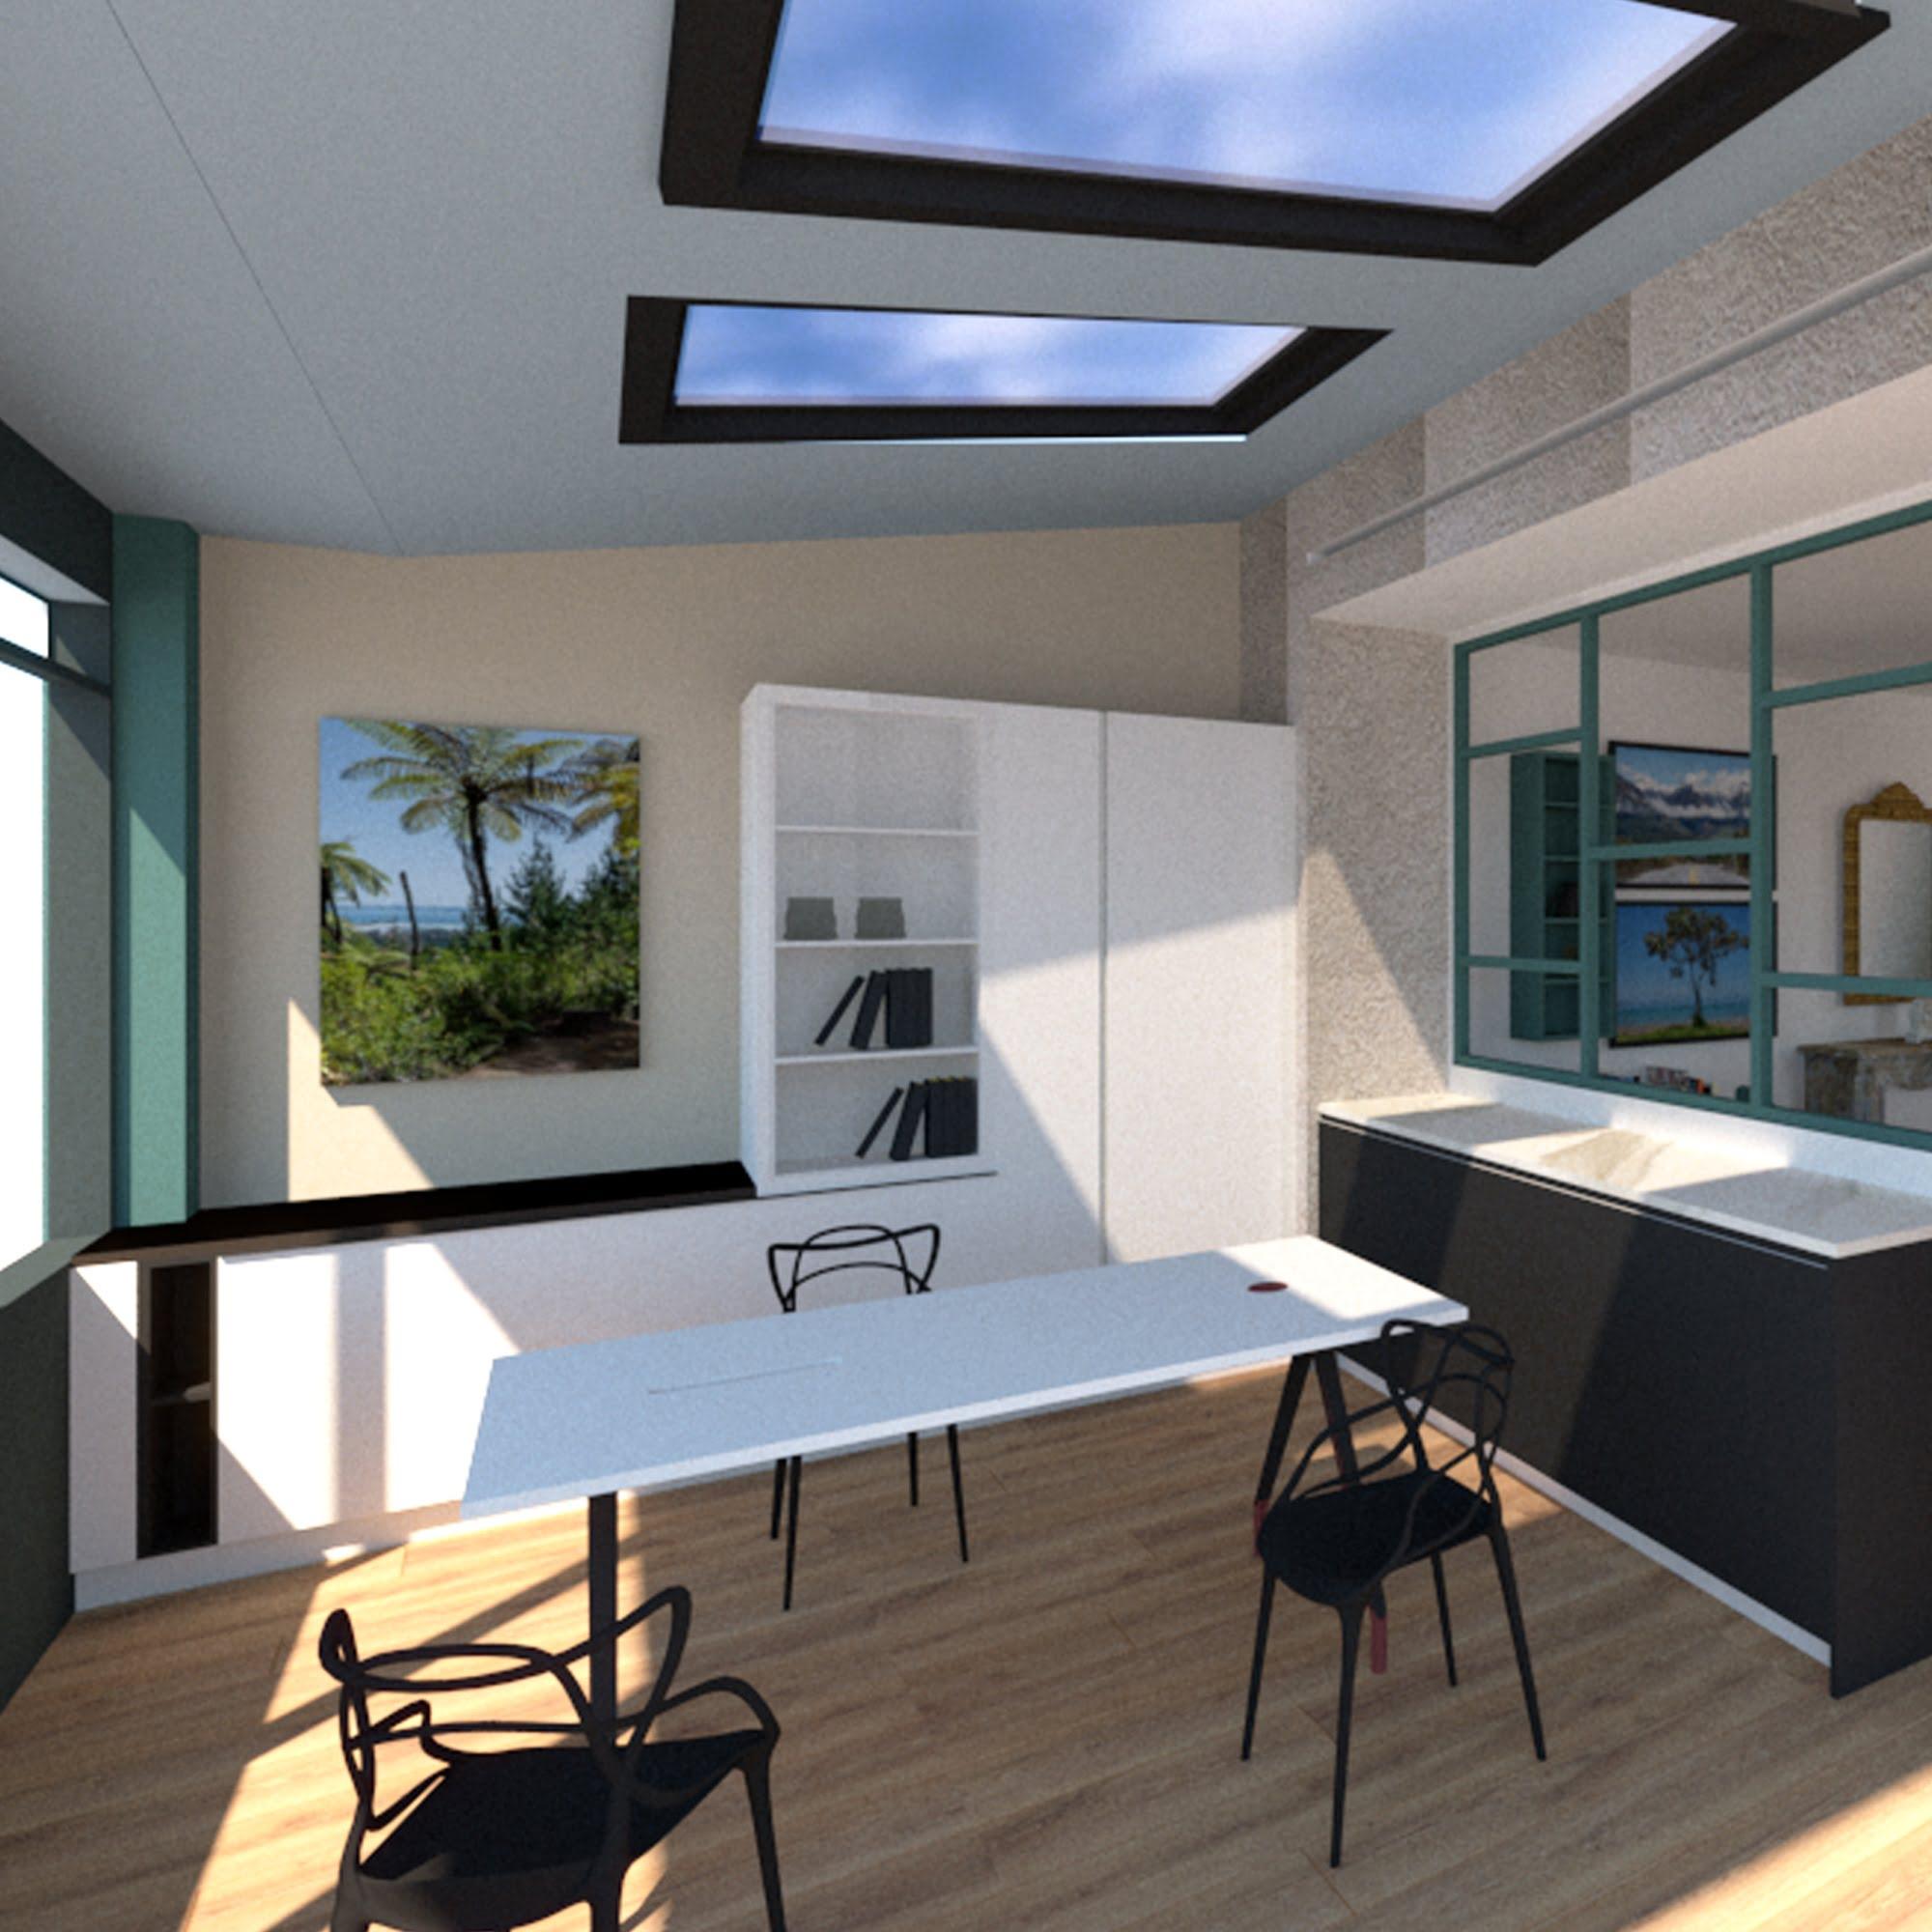 projet showroom ls studio 3D ls studio architecte intérieur vannes